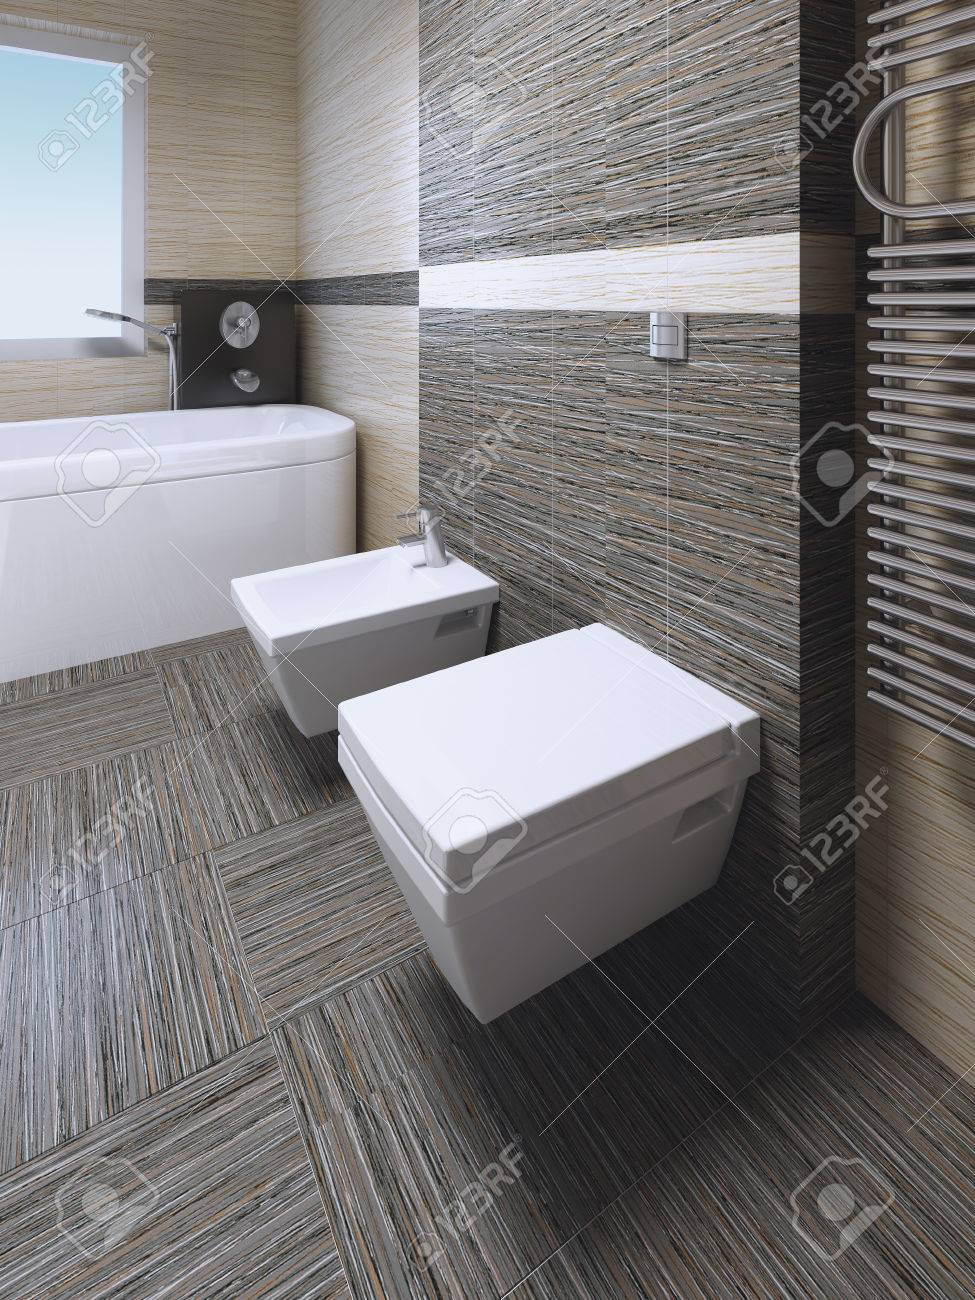 Toilet And Bidet In Modern Bathroom With Zebrano Striped Ceramic Tile. 3D  Render Stock Photo